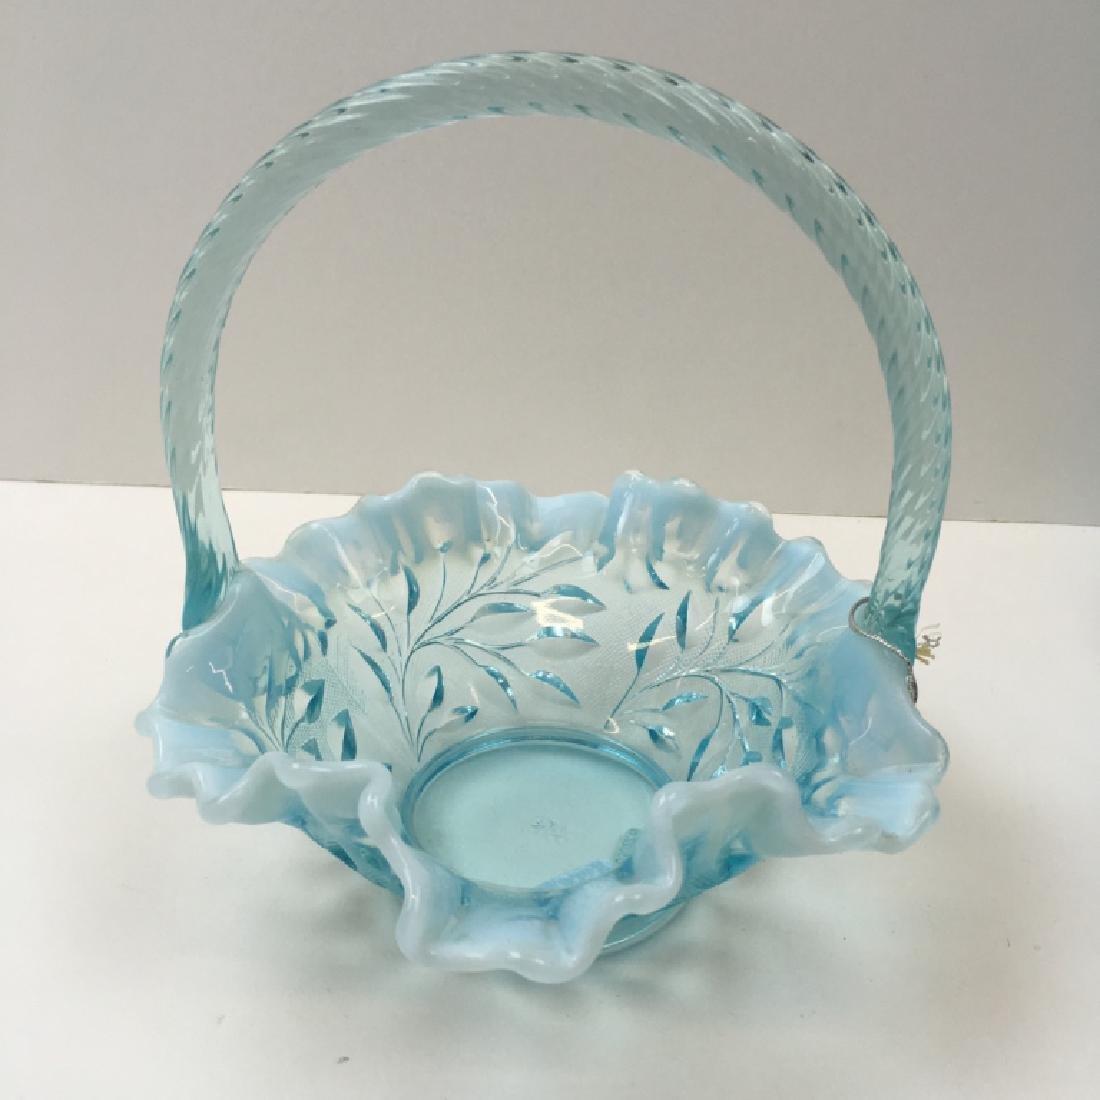 5 PCS OF VINTAGE BLUE OPALESCENT & SATIN GLASS - 14